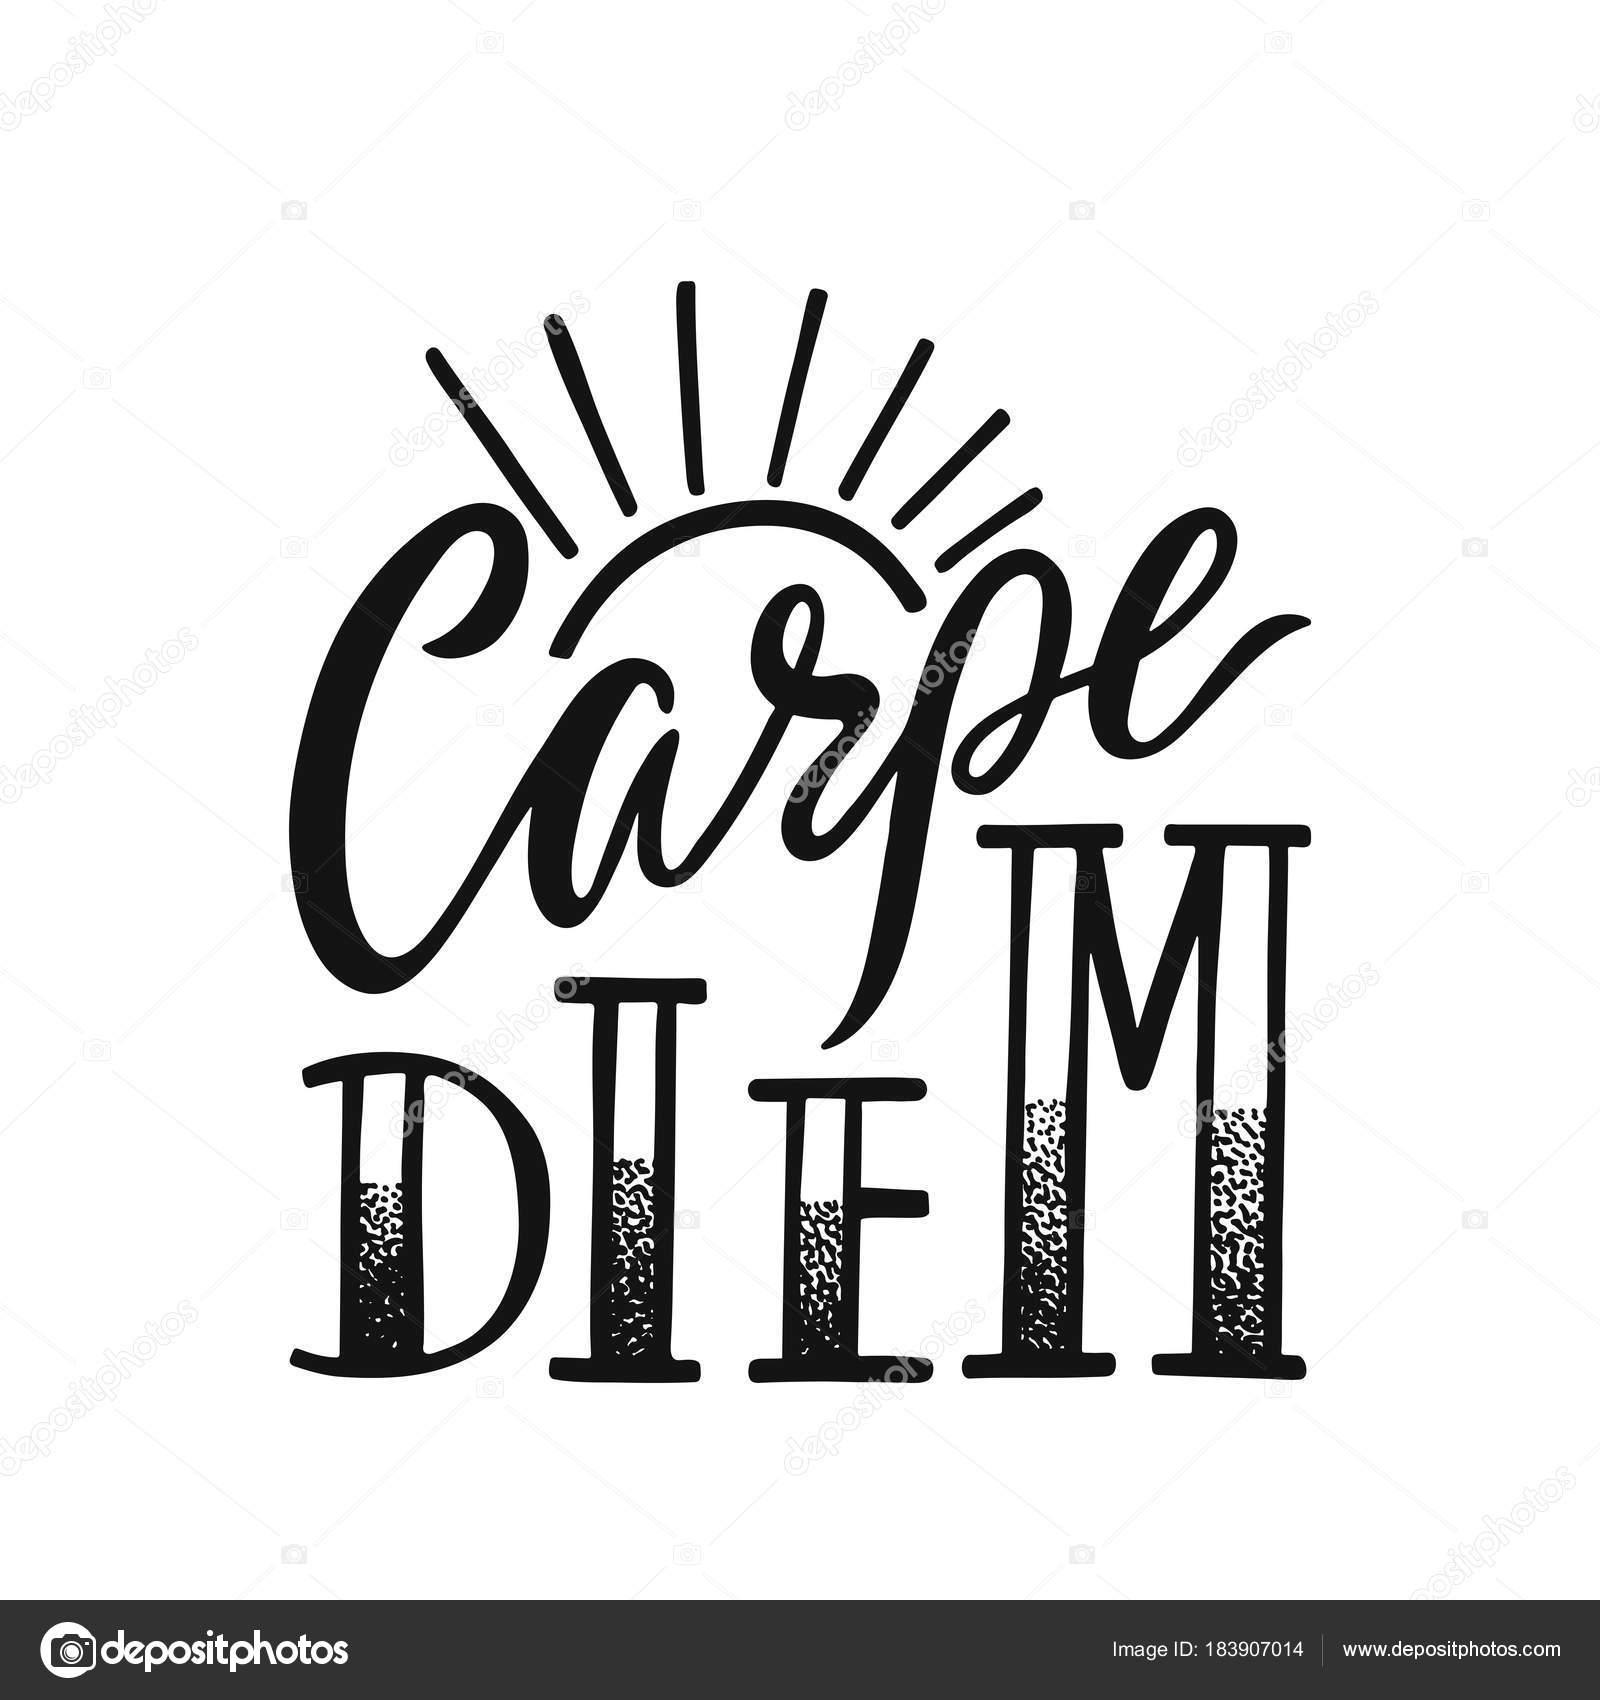 e5596b7c6ad7 Το Carpe Diem - Λατινική φράση σημαίνει Αδράξτε την ημέρα. Χέρι συρμένο  εμπνευσμένη διάνυσμα προσφορά